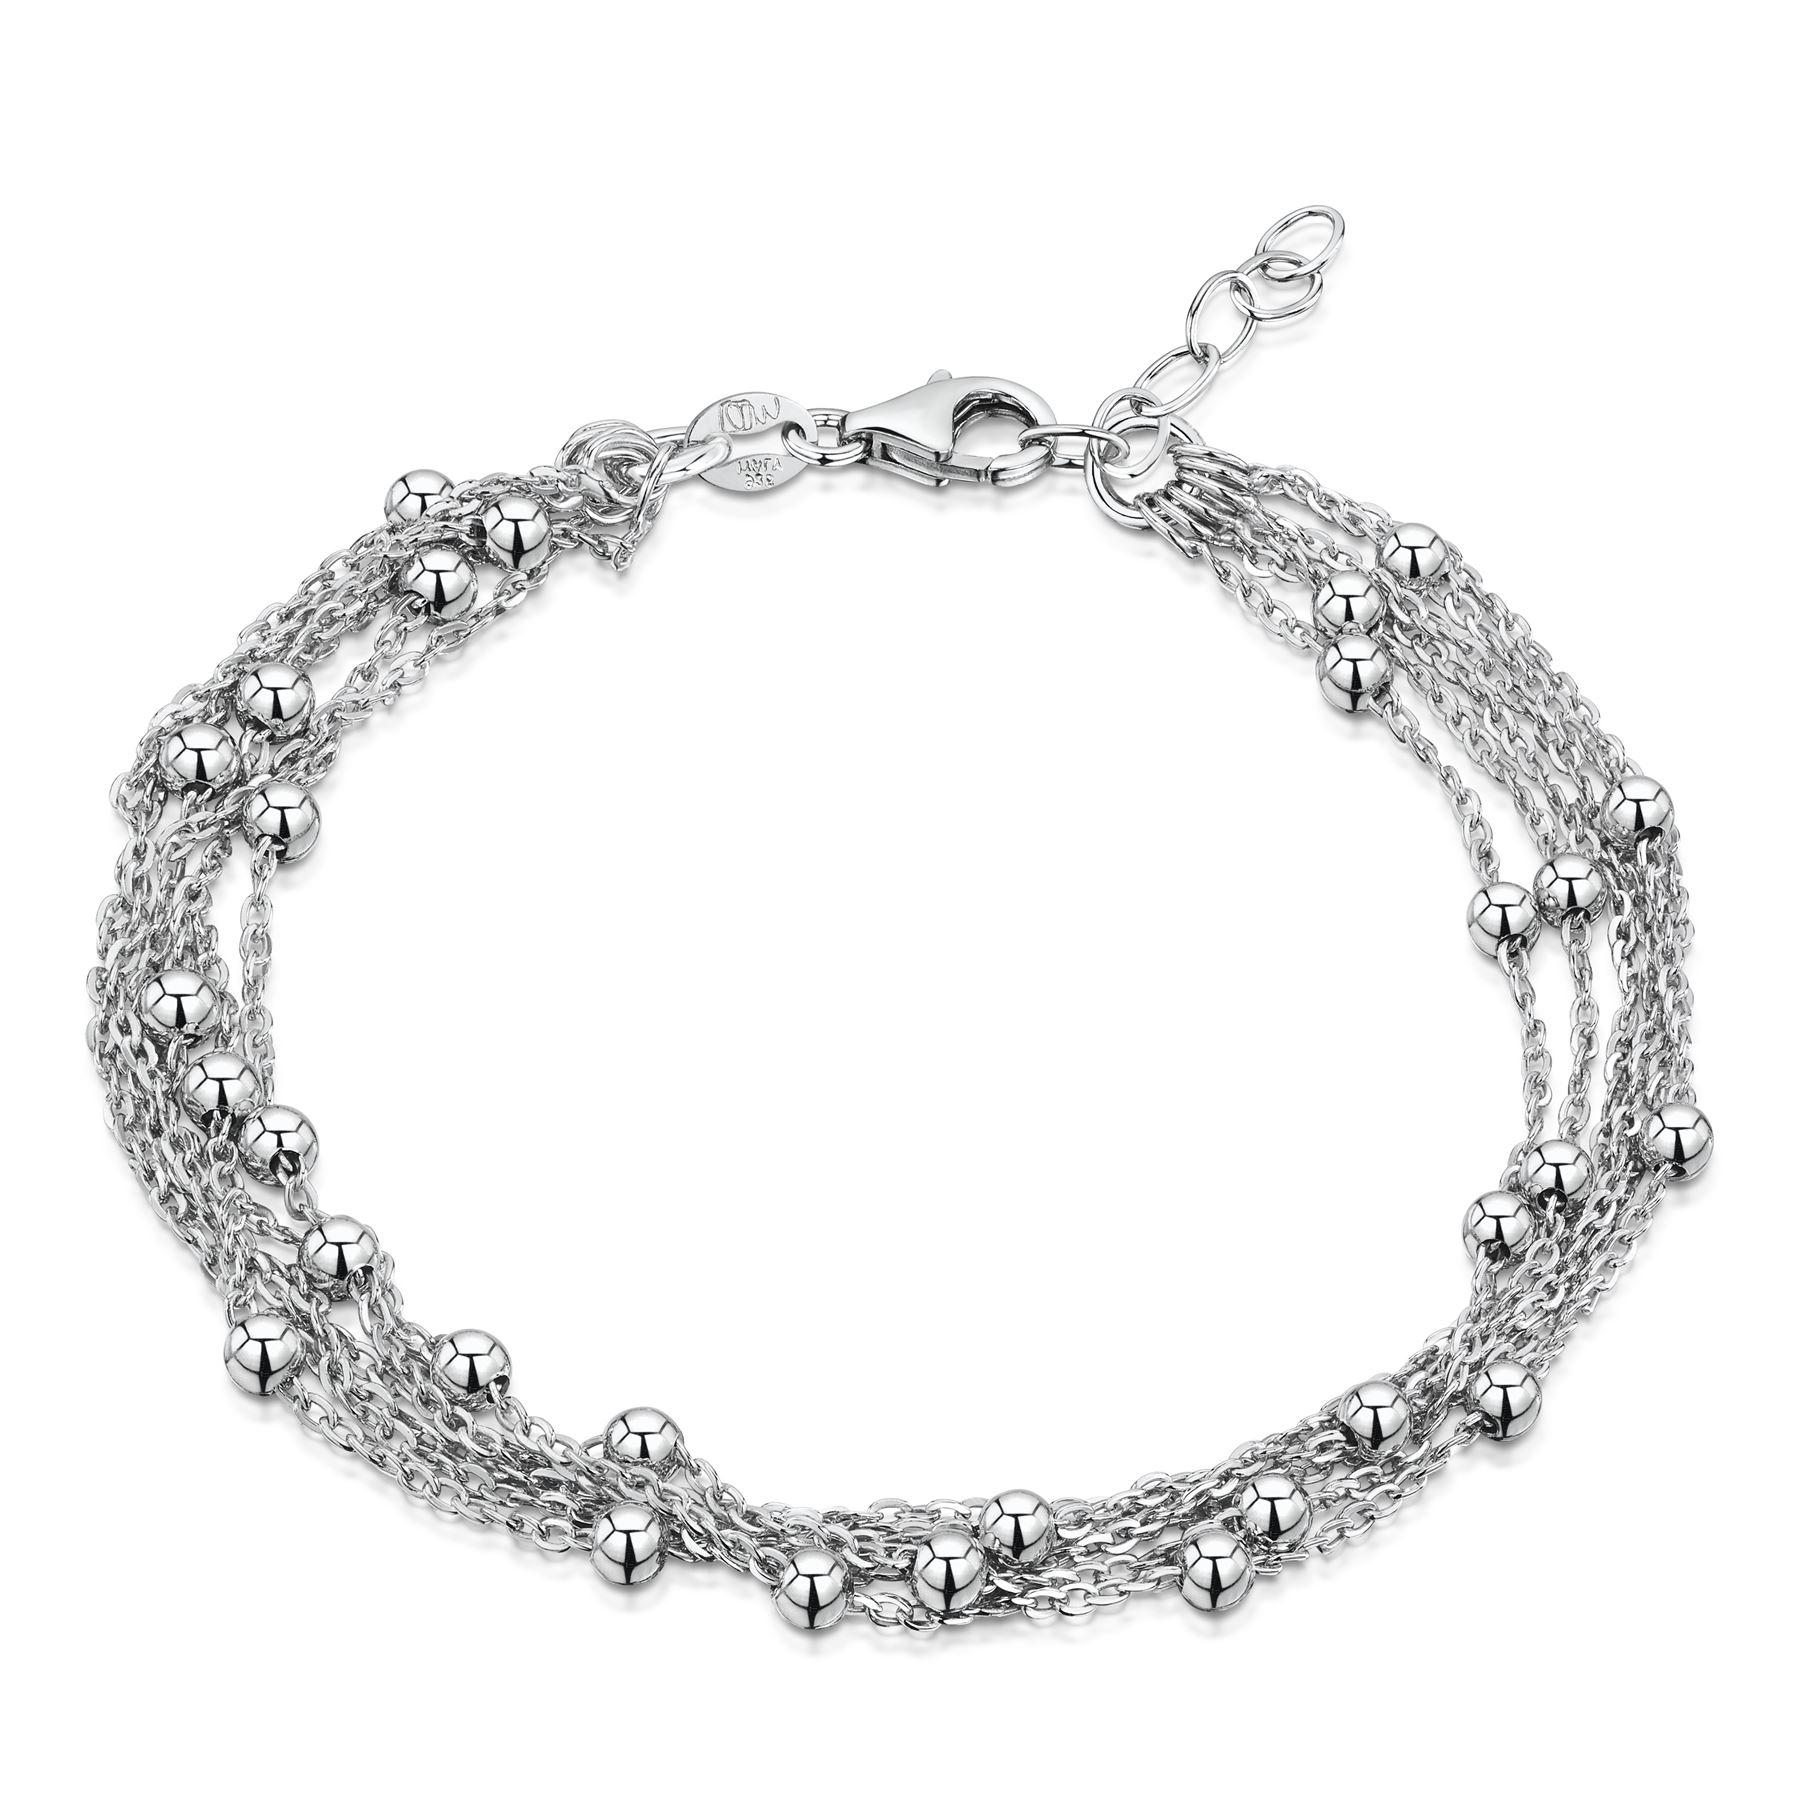 Amberta-Jewelry-925-Sterling-Silver-Adjustable-Bracelet-Italian-Bangle-for-Women thumbnail 26